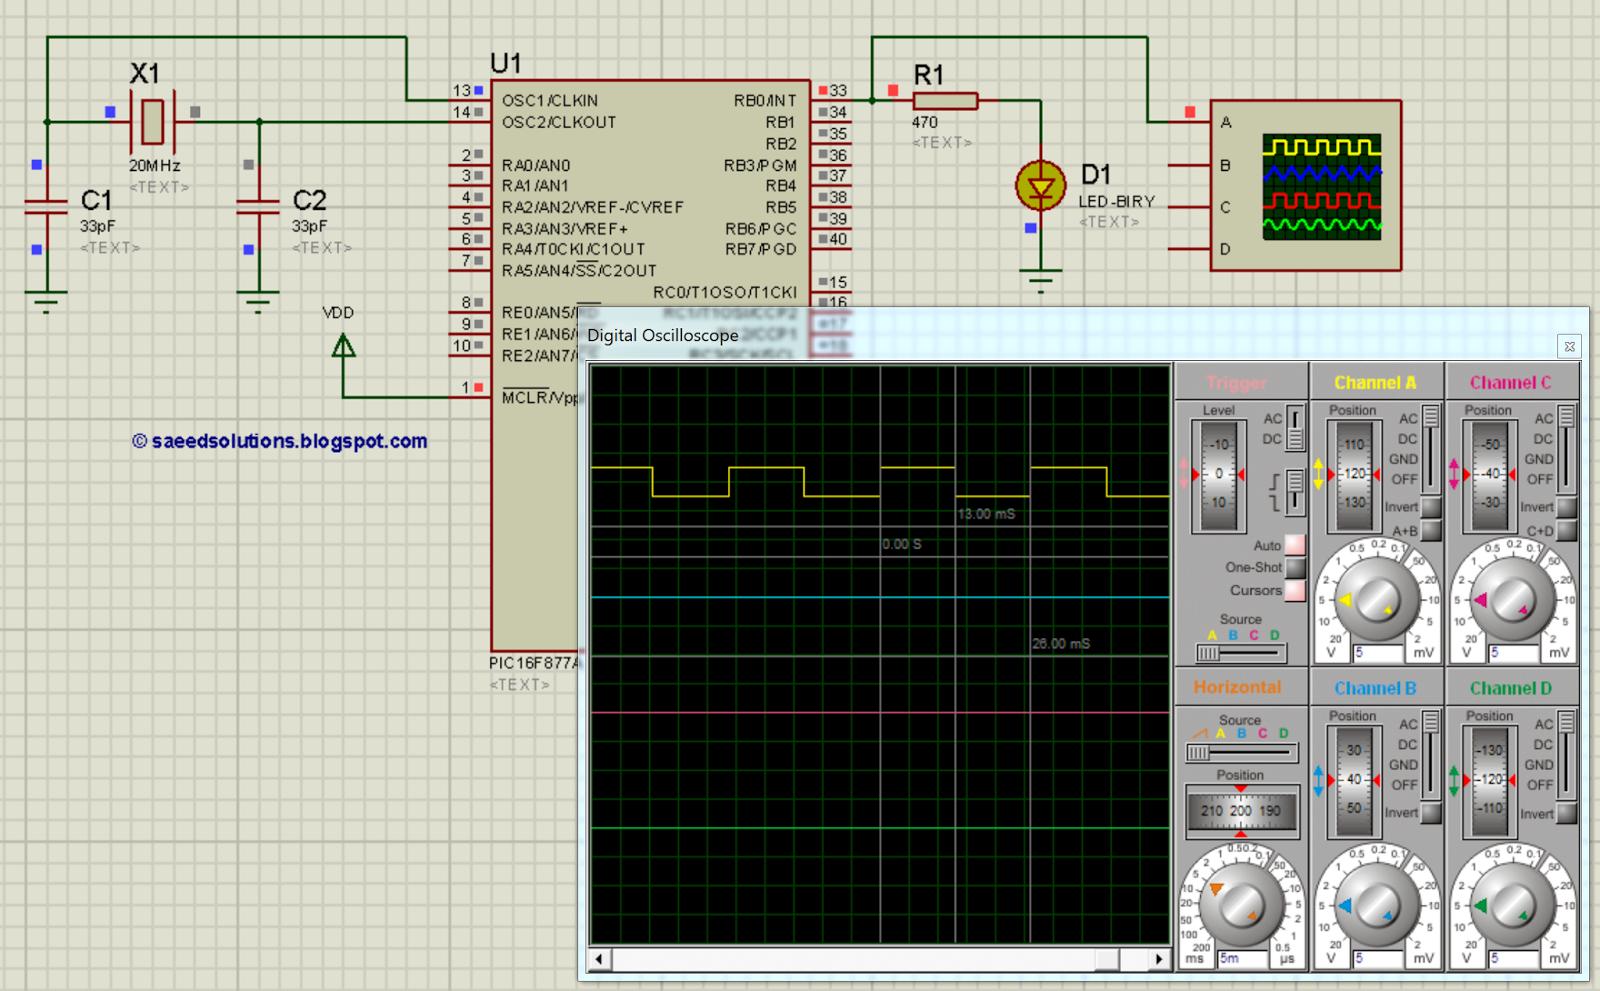 Calculator Build Using Pic16f877a Microcontroller Circuit Diagram